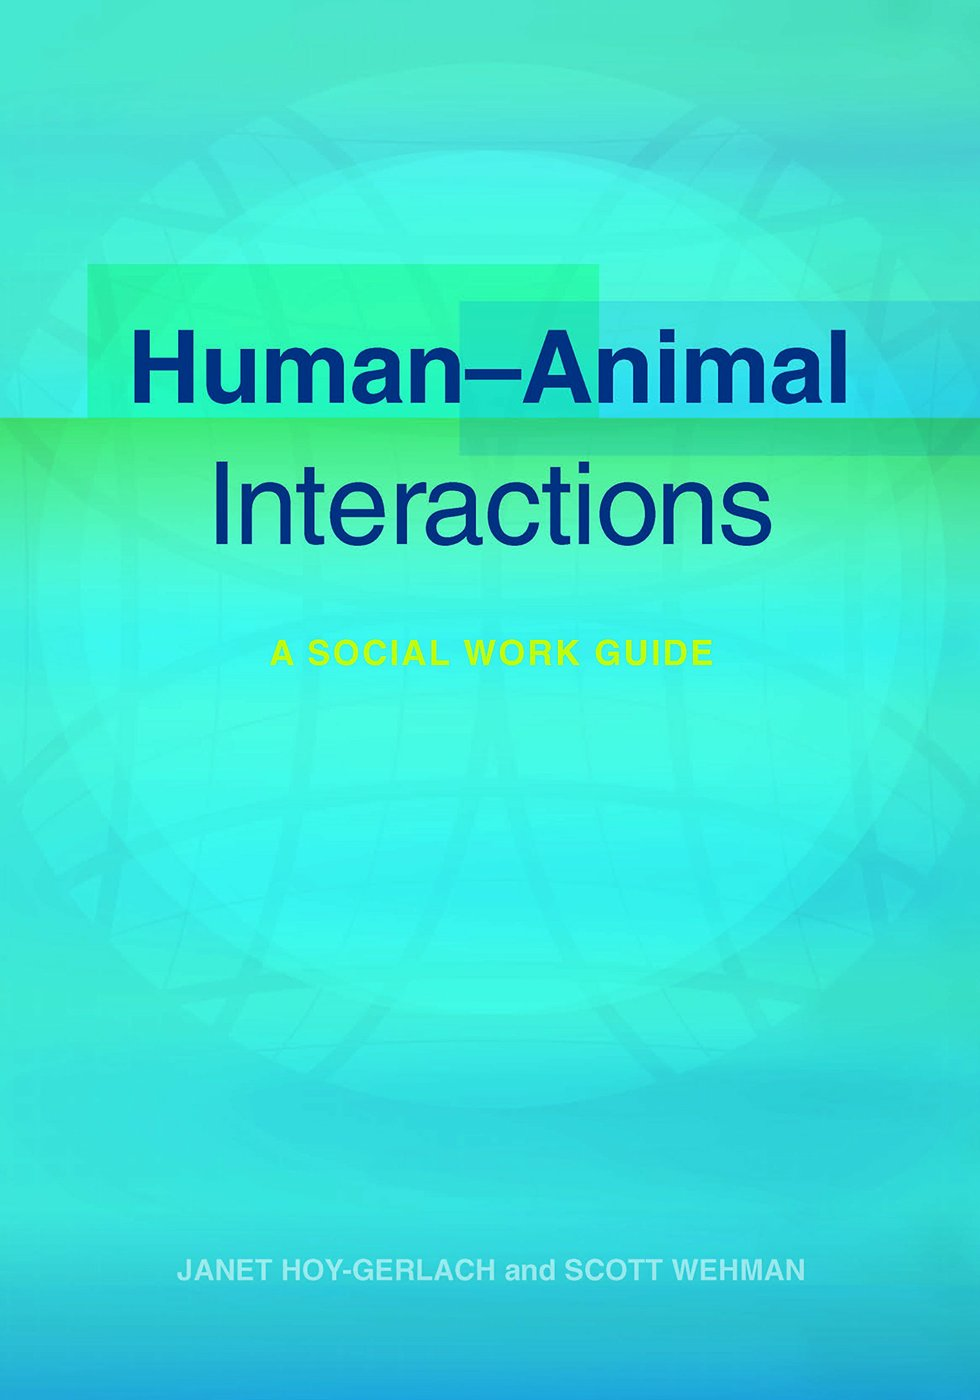 Human-Animal Interactions